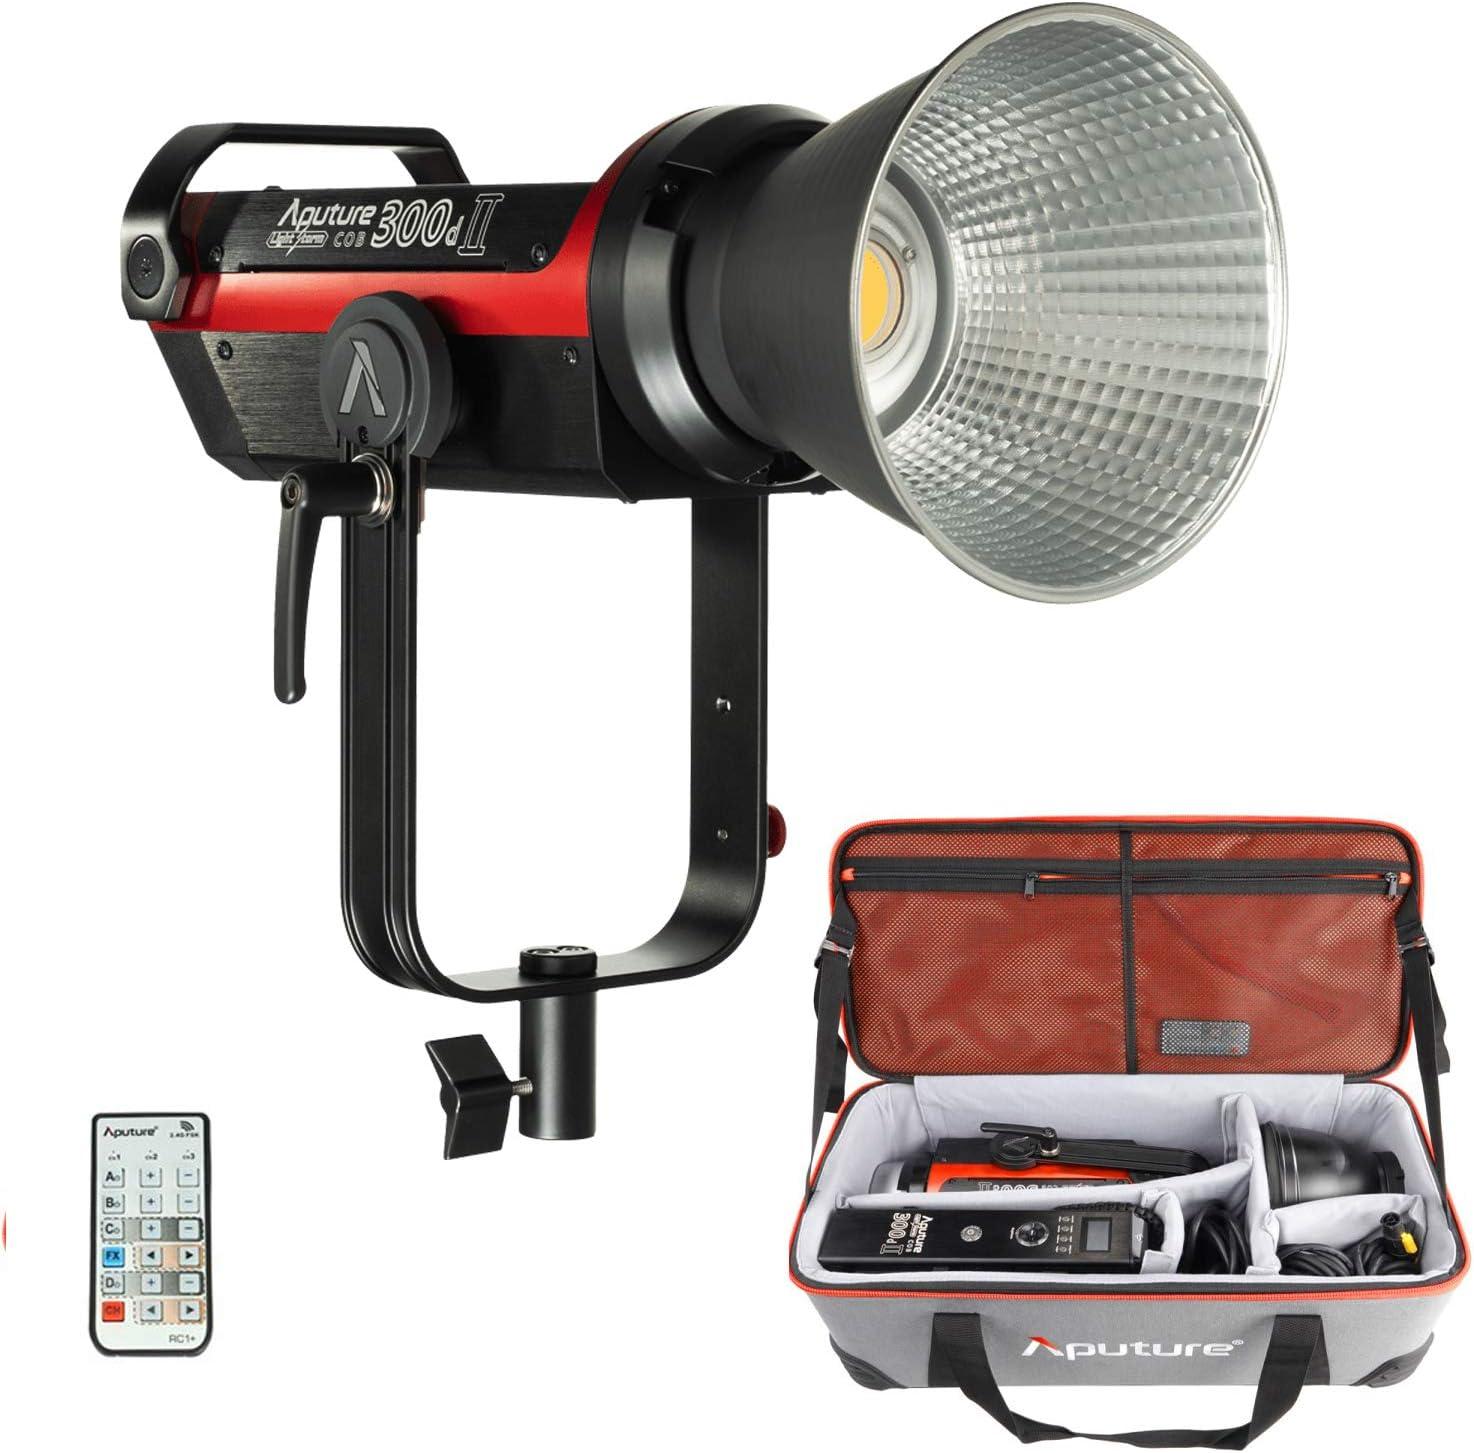 Amazon.com : Aputure LS C300D II COB Light Storm 300d Mark II 350W 5500K  Daylight Balanced Led Video Light CRI 96+ TLCI96+ 45000lux@0.5m with The  Reflector 8 Built-in Lighting FX Low V-Mount :